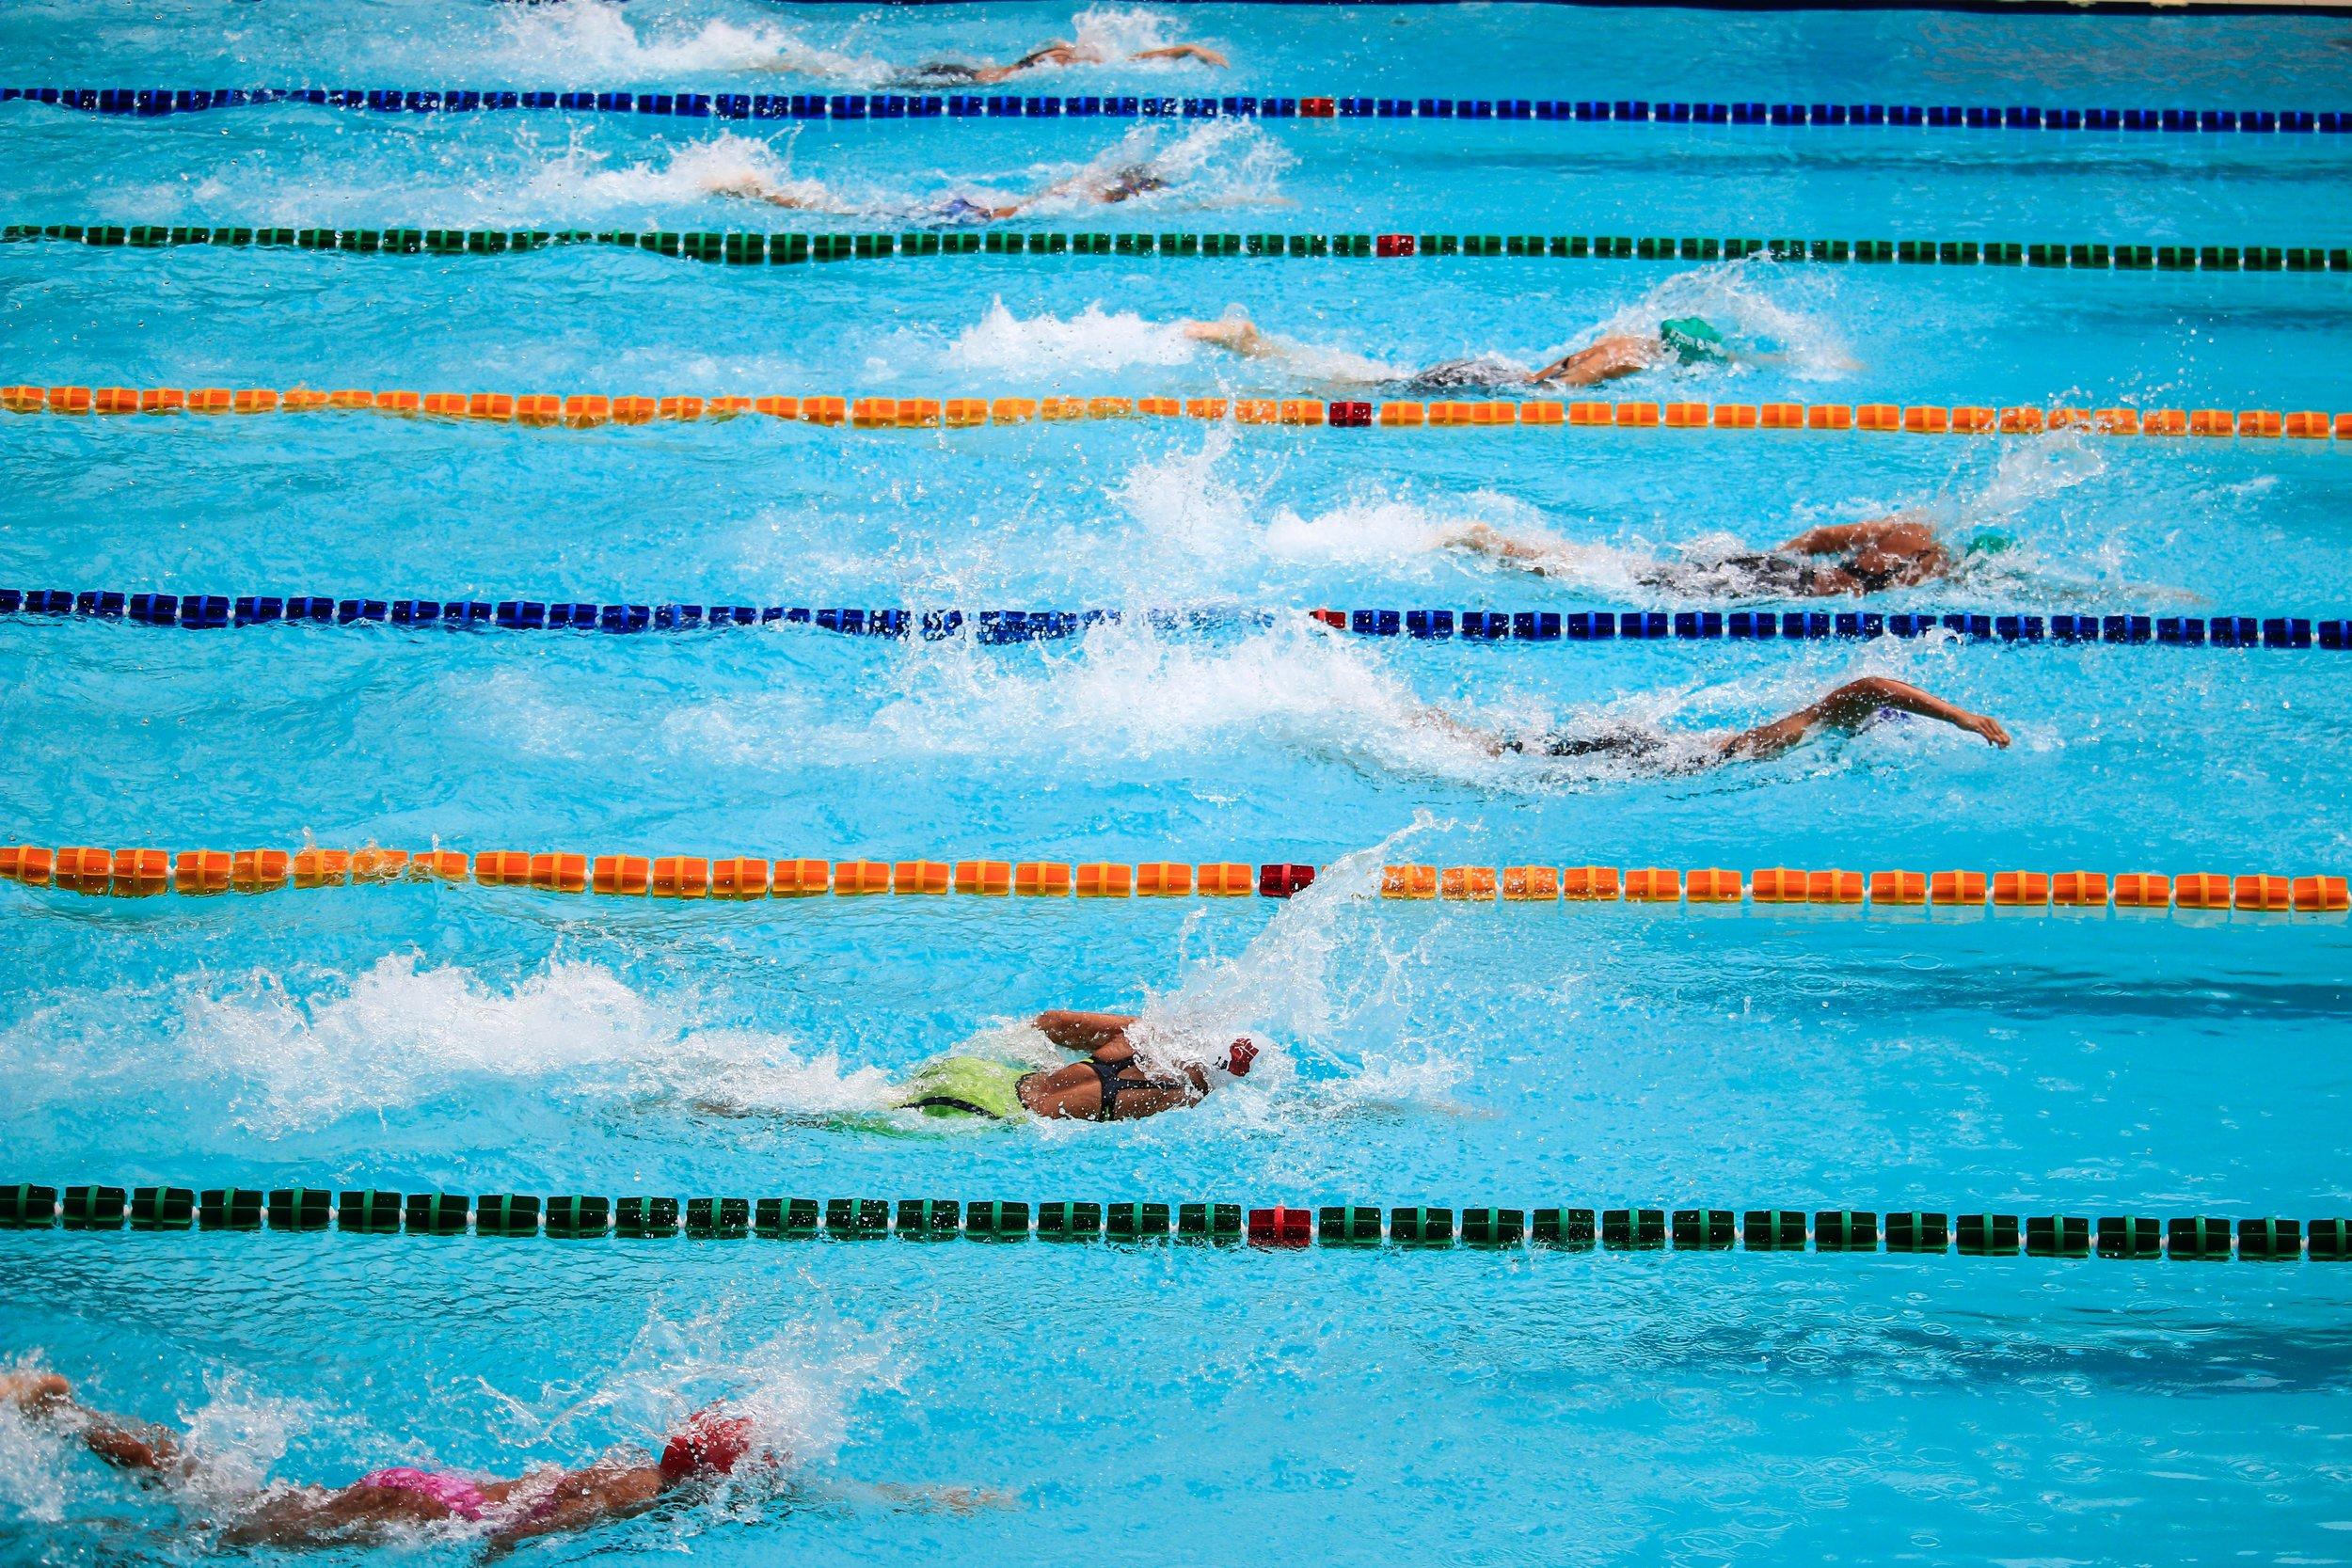 Swim Races can prepare you for your triathlon season